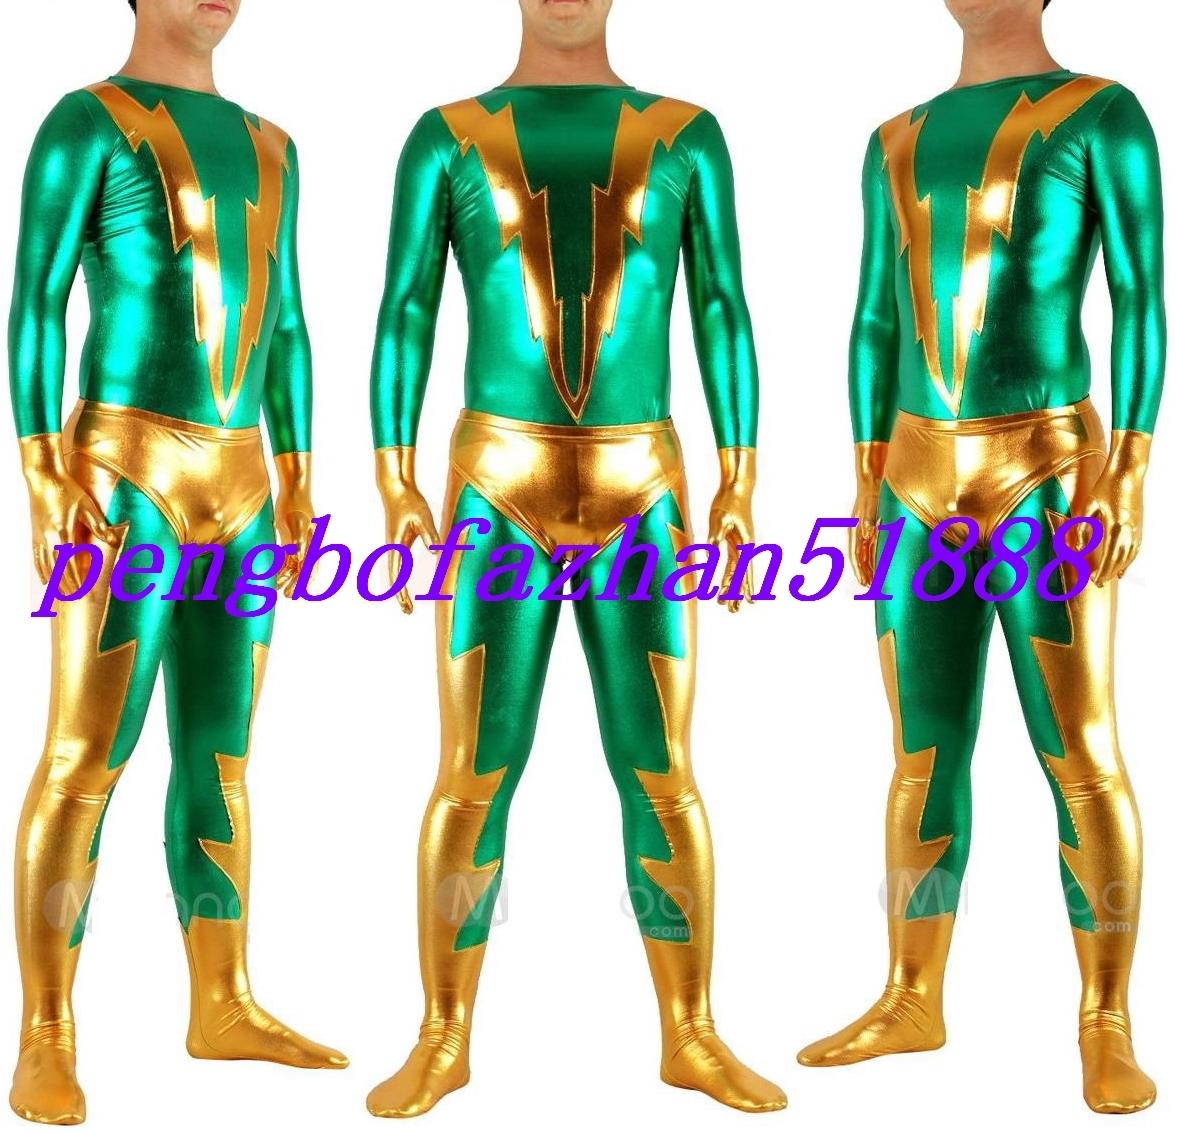 HALLOWEEN COSPLAY SUIT GREEN/GOLD SHINY METALLIC FLASH SUIT CATSUIT COSTUME S461 - $45.99